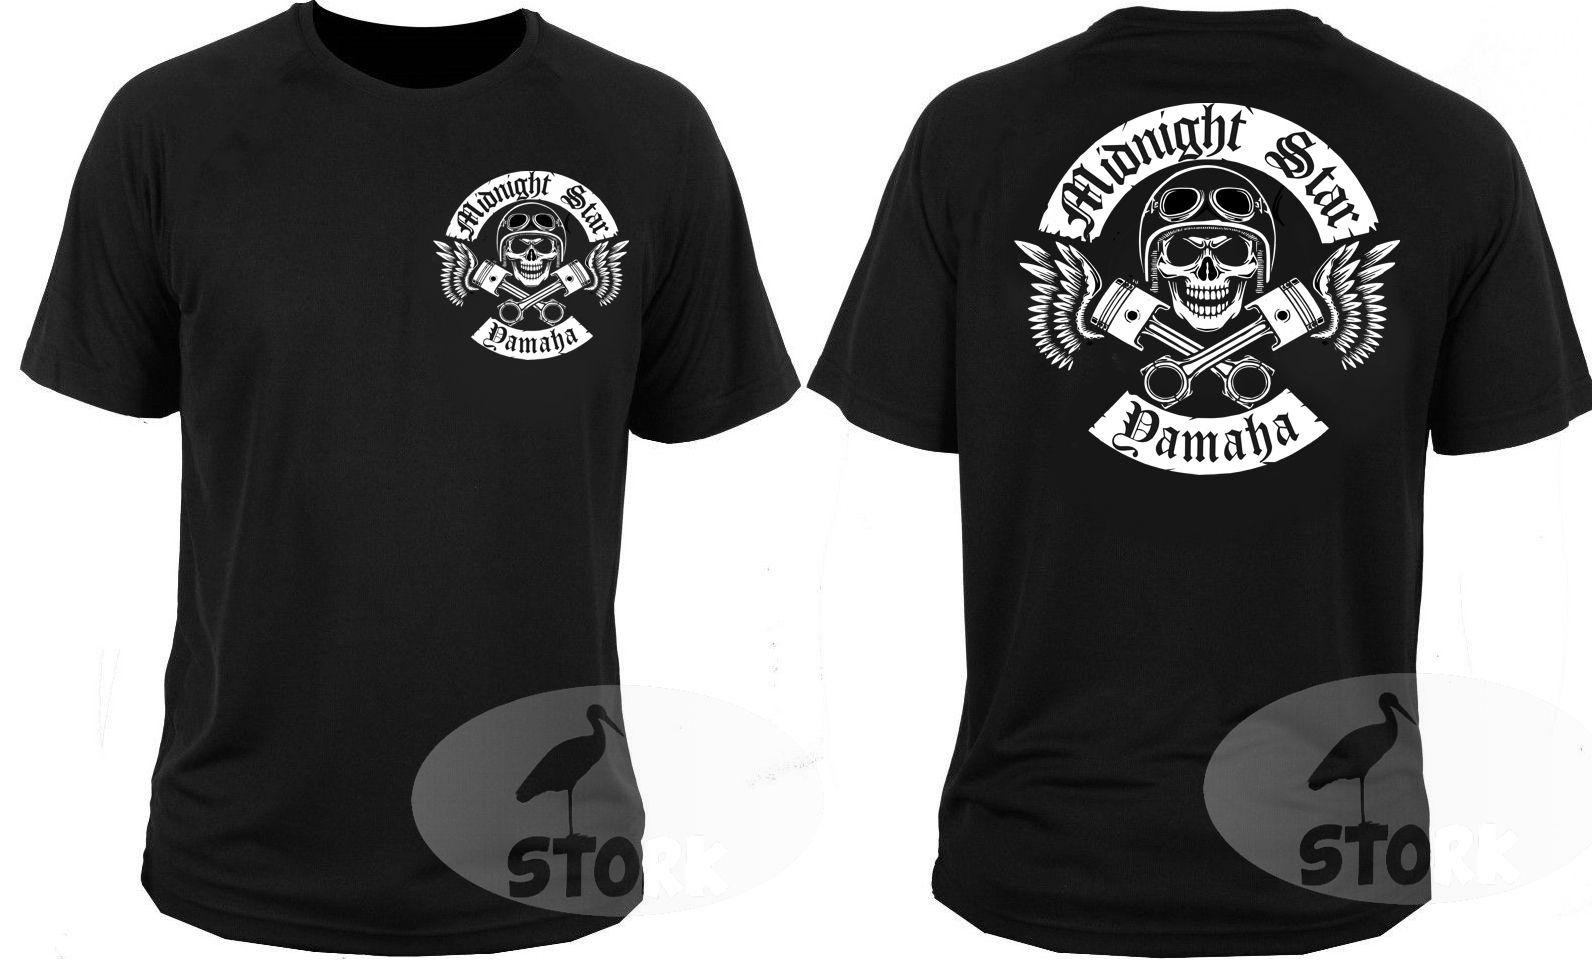 Newest 2017 Men's Fashion T Shirt T-shirt Midnight Star Cruiser Chopper Motorcycle Rockers Motorbike Cool T Shirts For Men